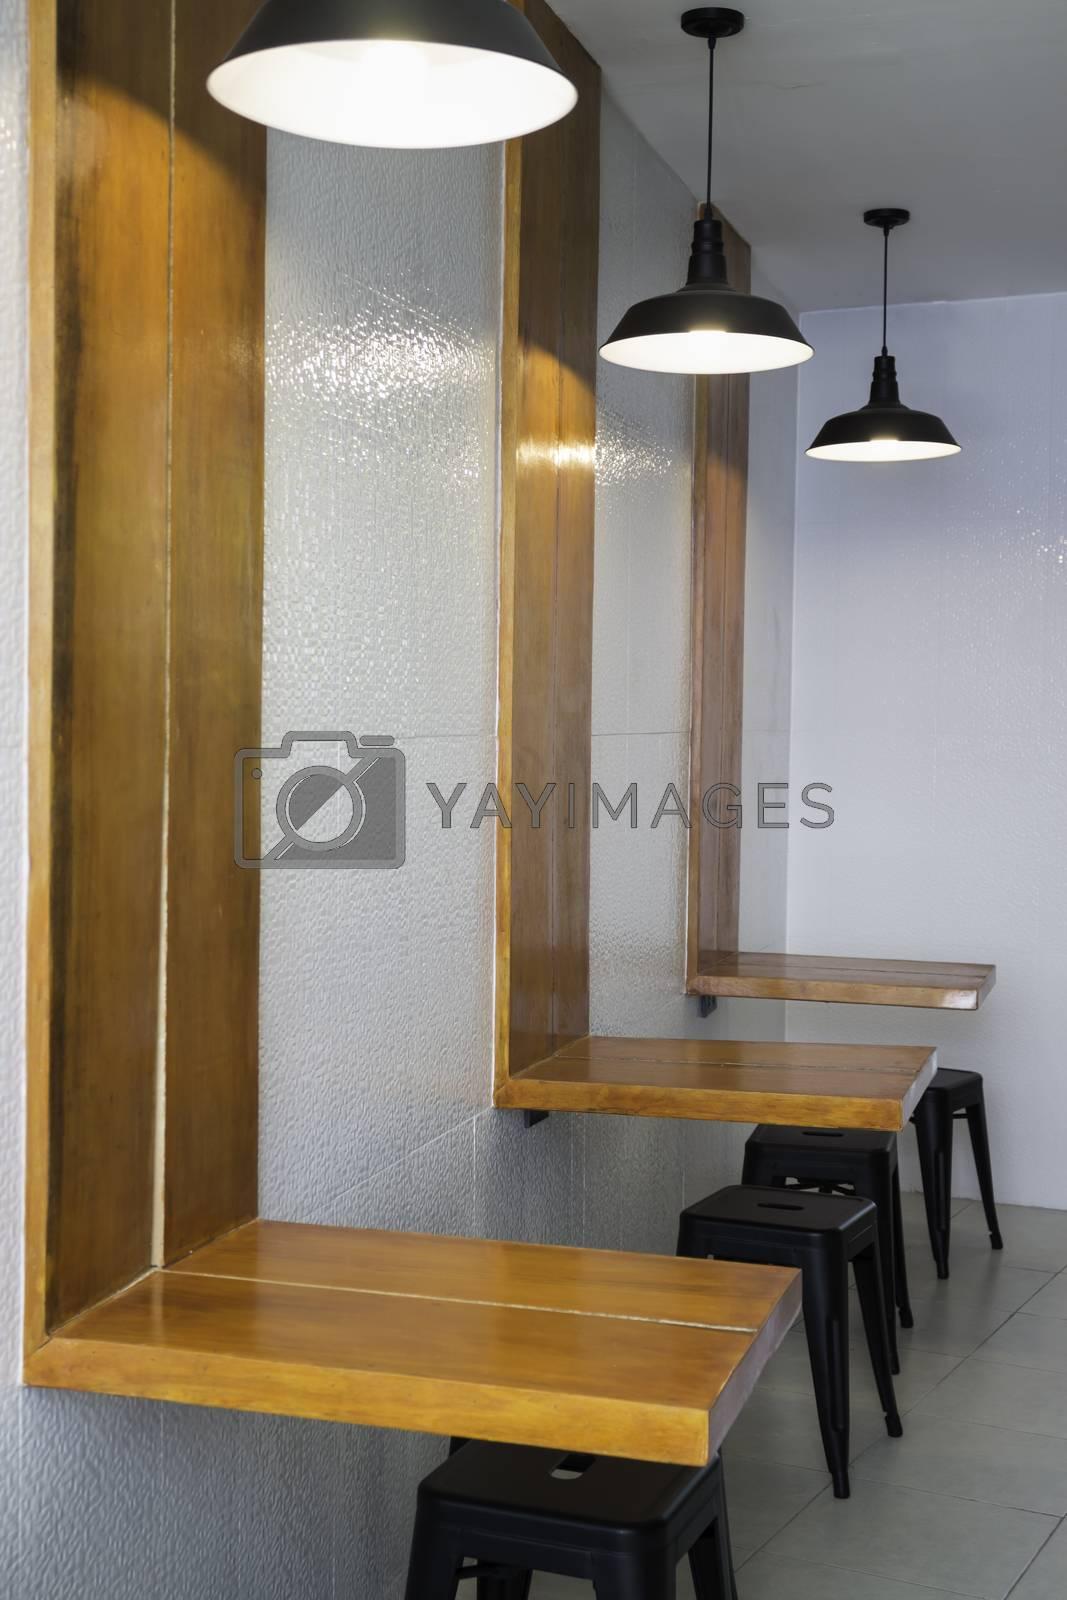 Modern furniture in indy coffee shop by nalinratphi